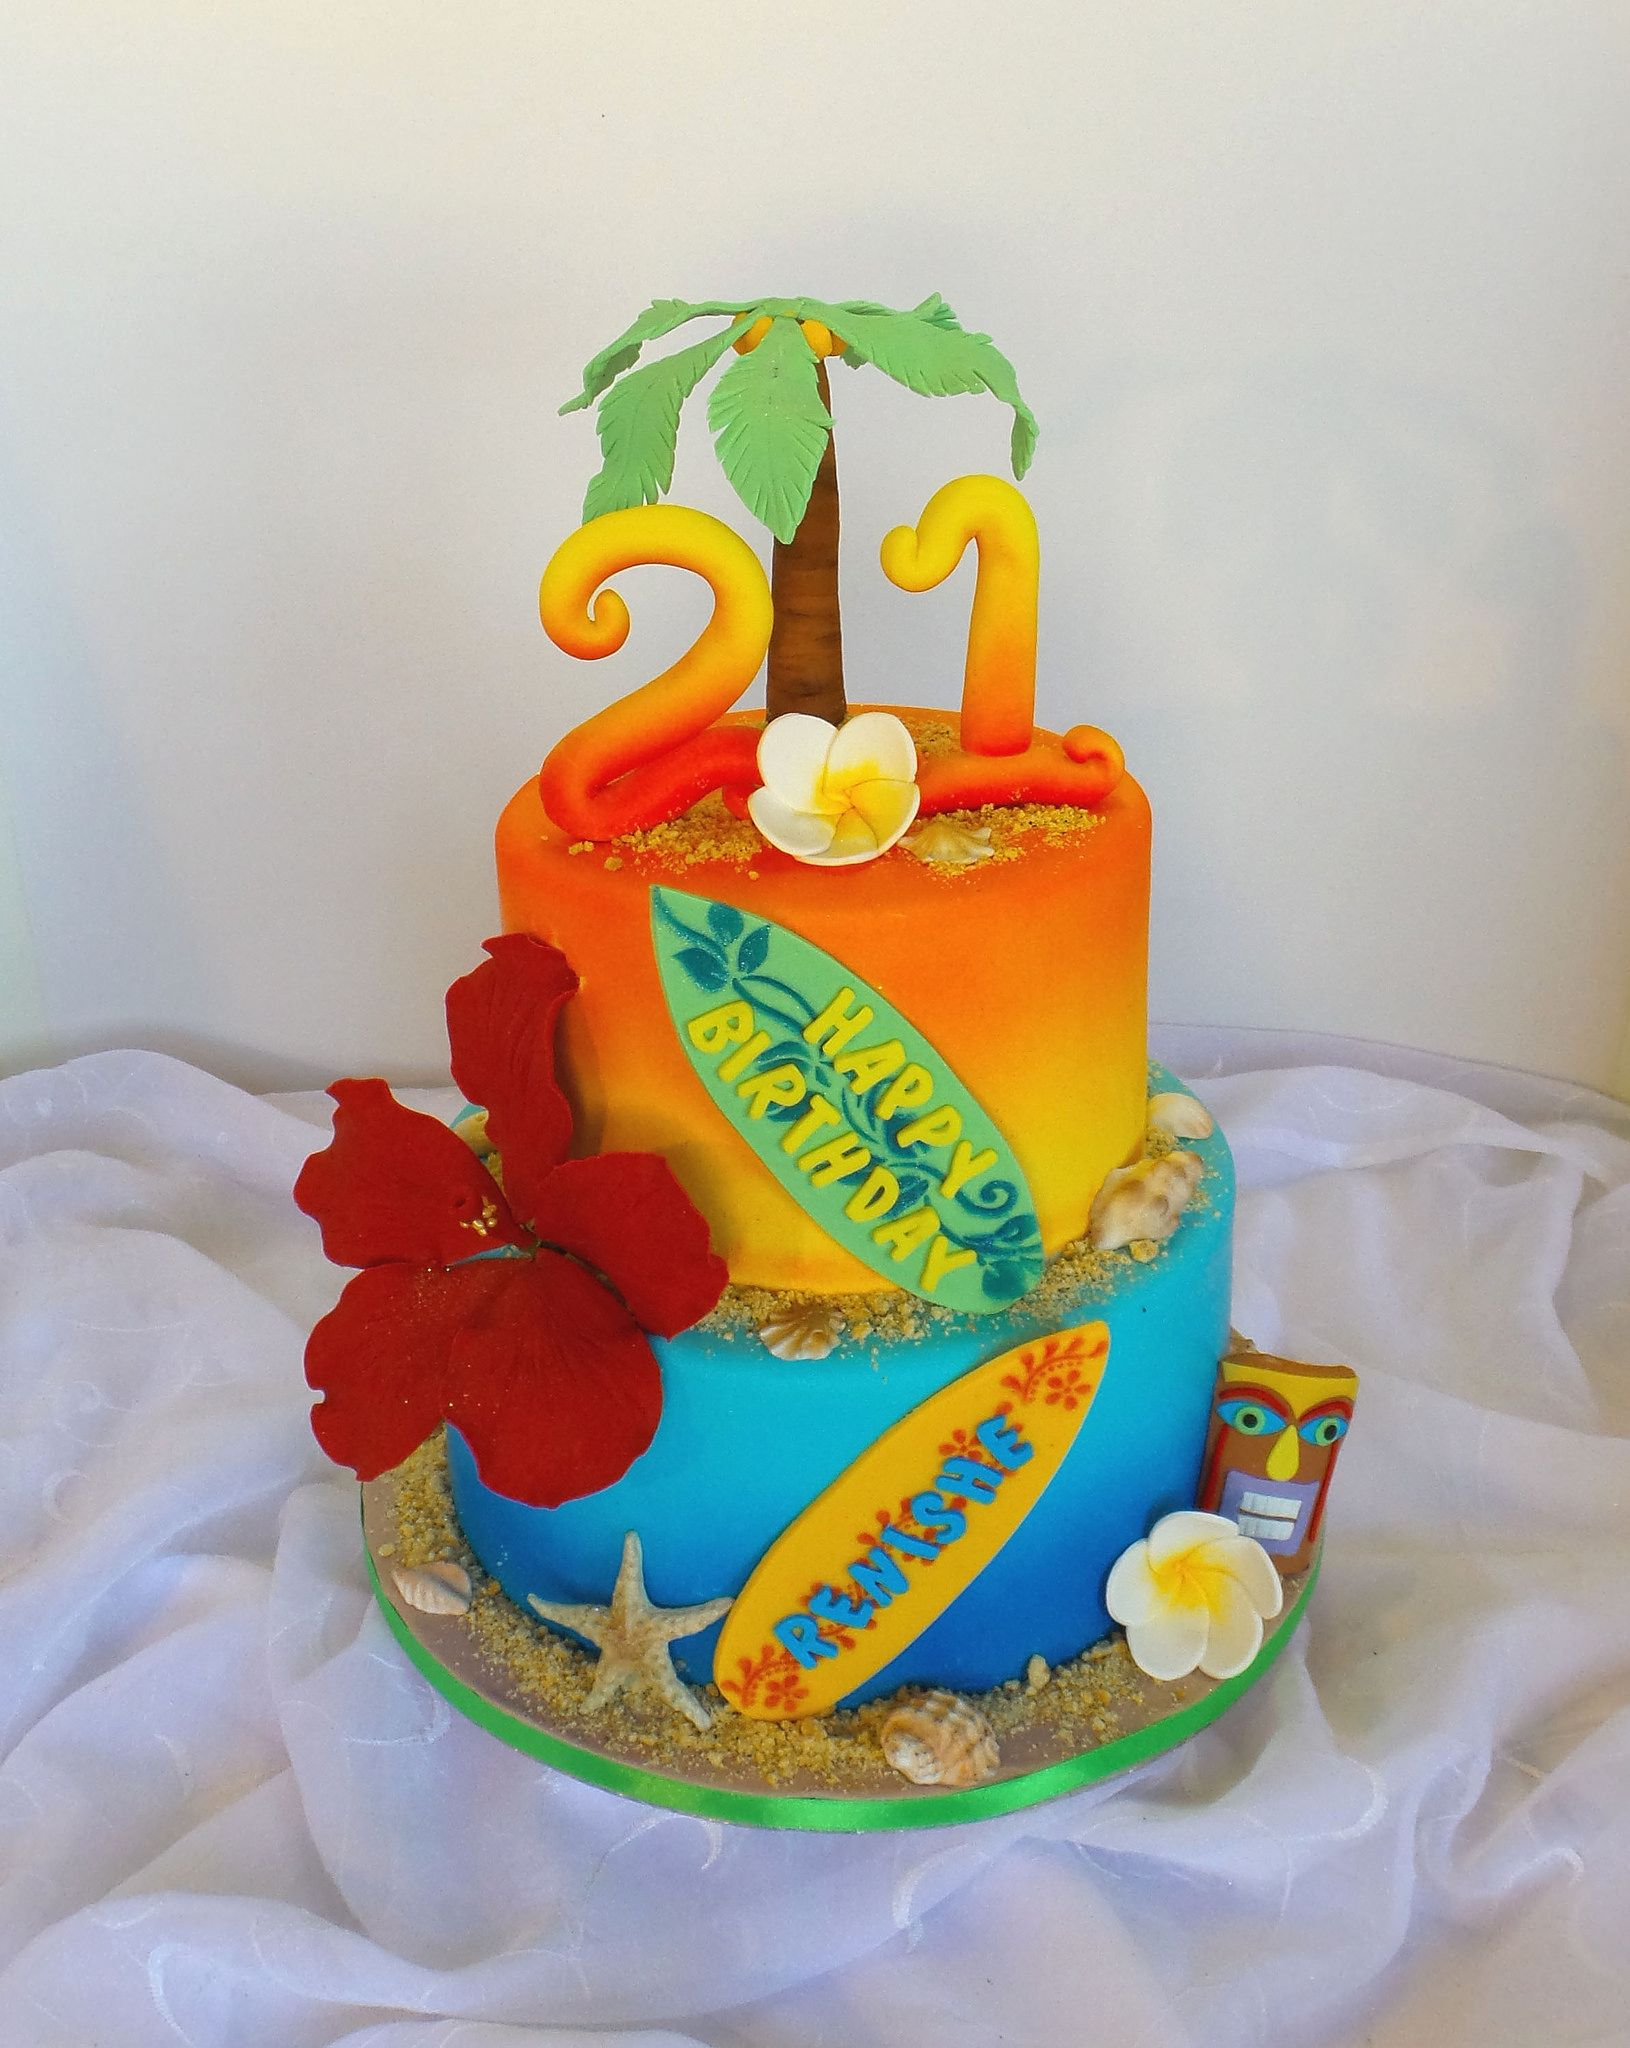 Swell Hawaii Themed 21St Birthday Cake 21St Birthday Cake Hawaii Funny Birthday Cards Online Fluifree Goldxyz